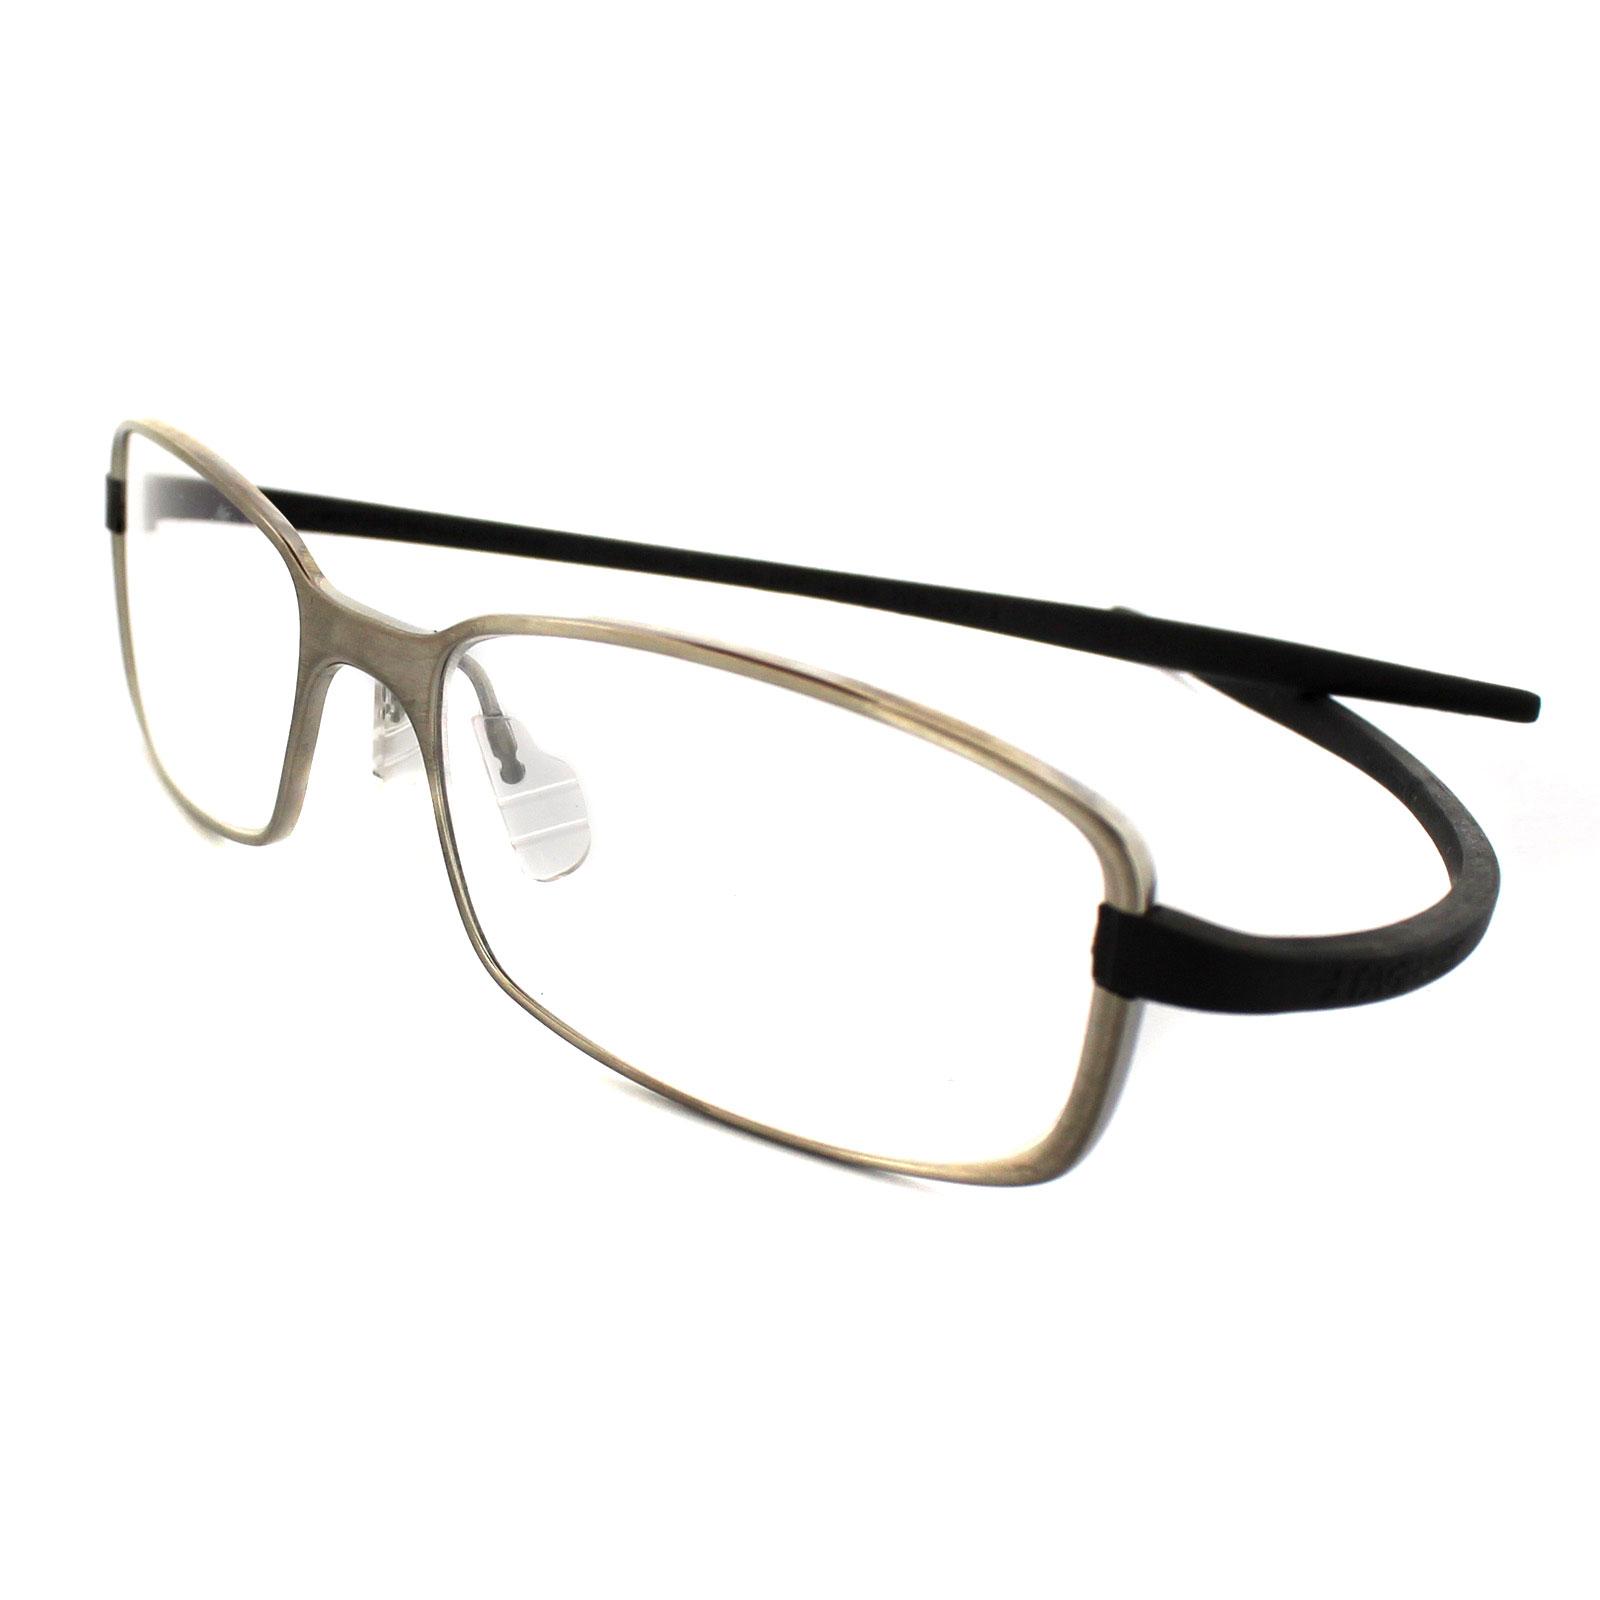 Tag heuer eyeglasses frames uk - Sentinel Tag Heuer Glasses 3706 017 Ceramic Titanium Silver Frames Grey Rubber Arms